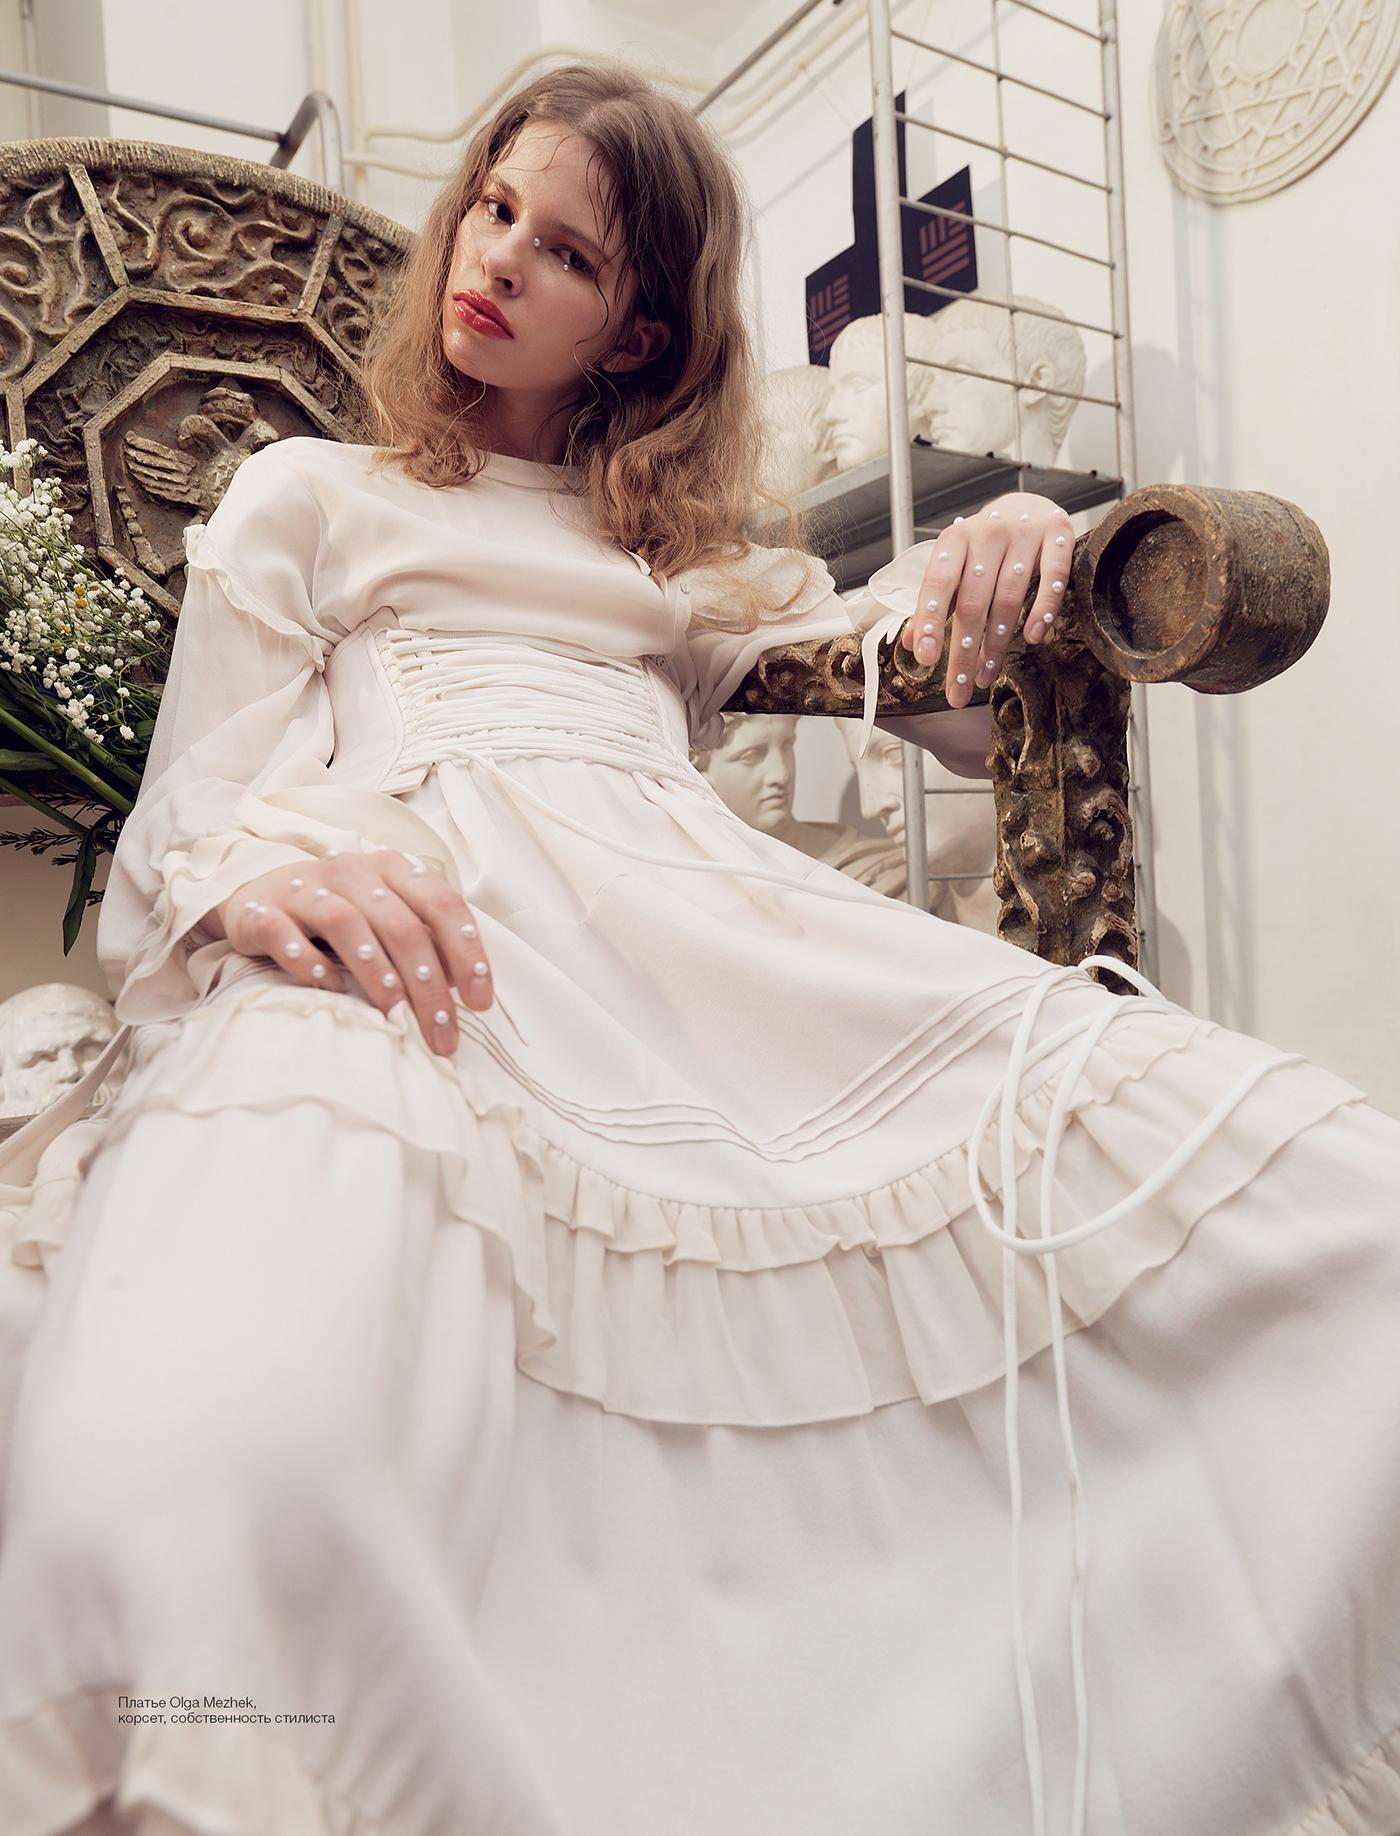 Наталья Тюнина SWEET UNDERGROUND / фото Игорь Уссенко - Igor Oussenko